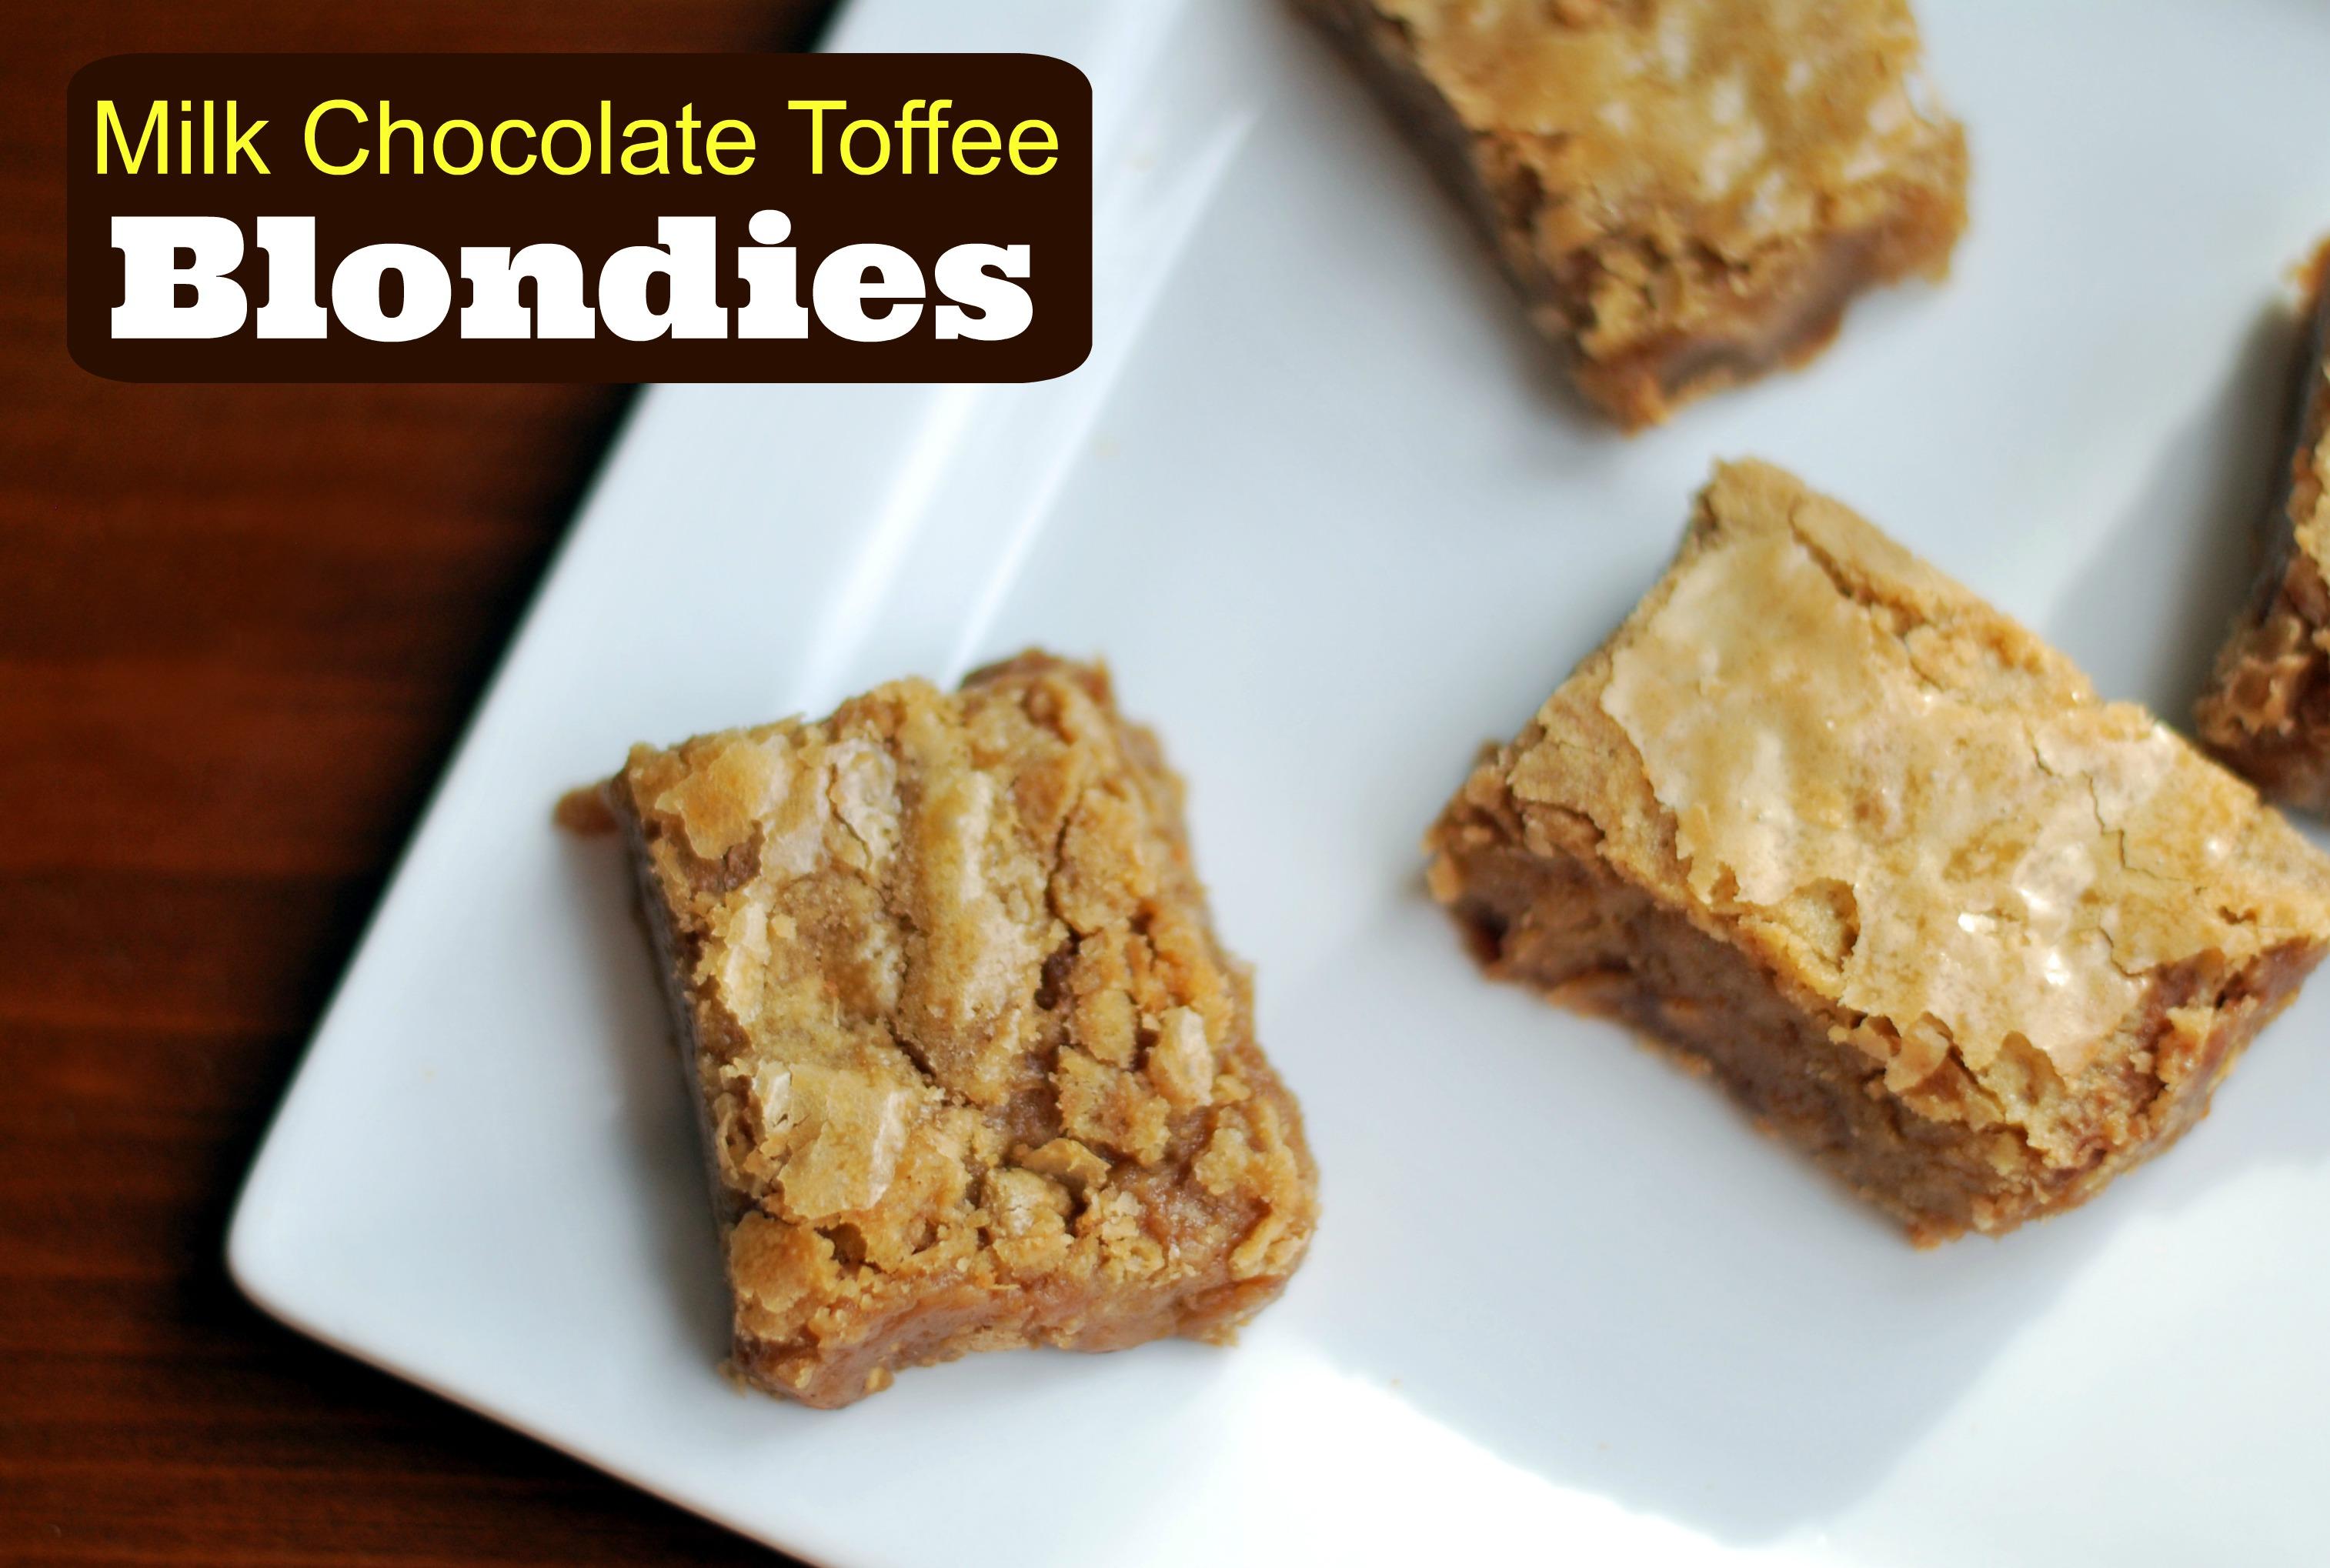 Milk Chocolate Toffee Blondies